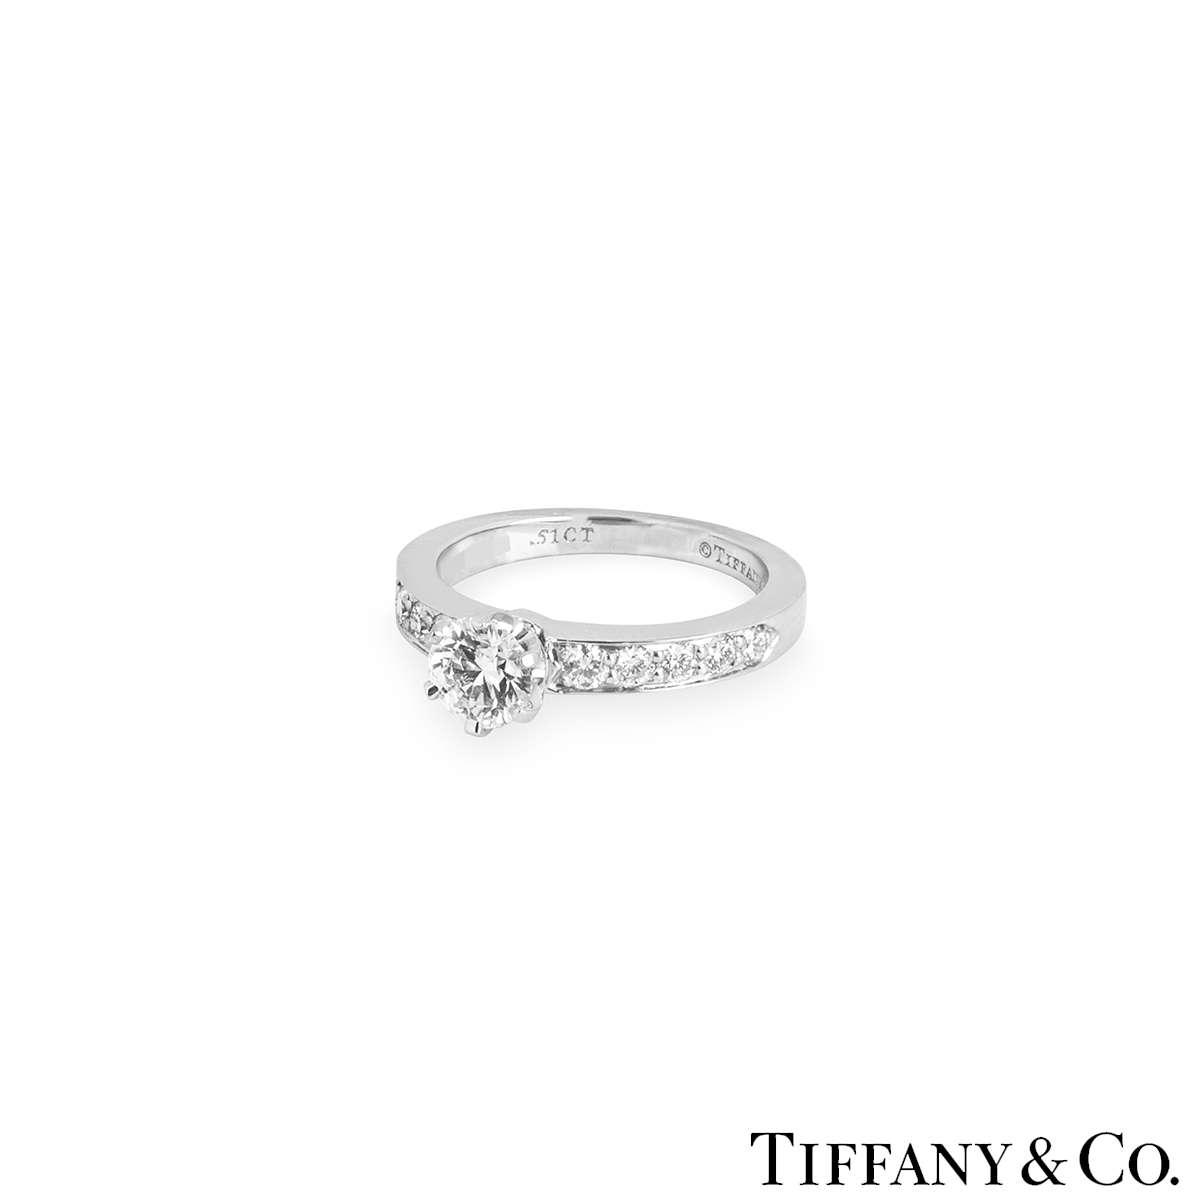 Tiffany & Co. Platinum Diamond Setting Ring 0.51ct G/VS1